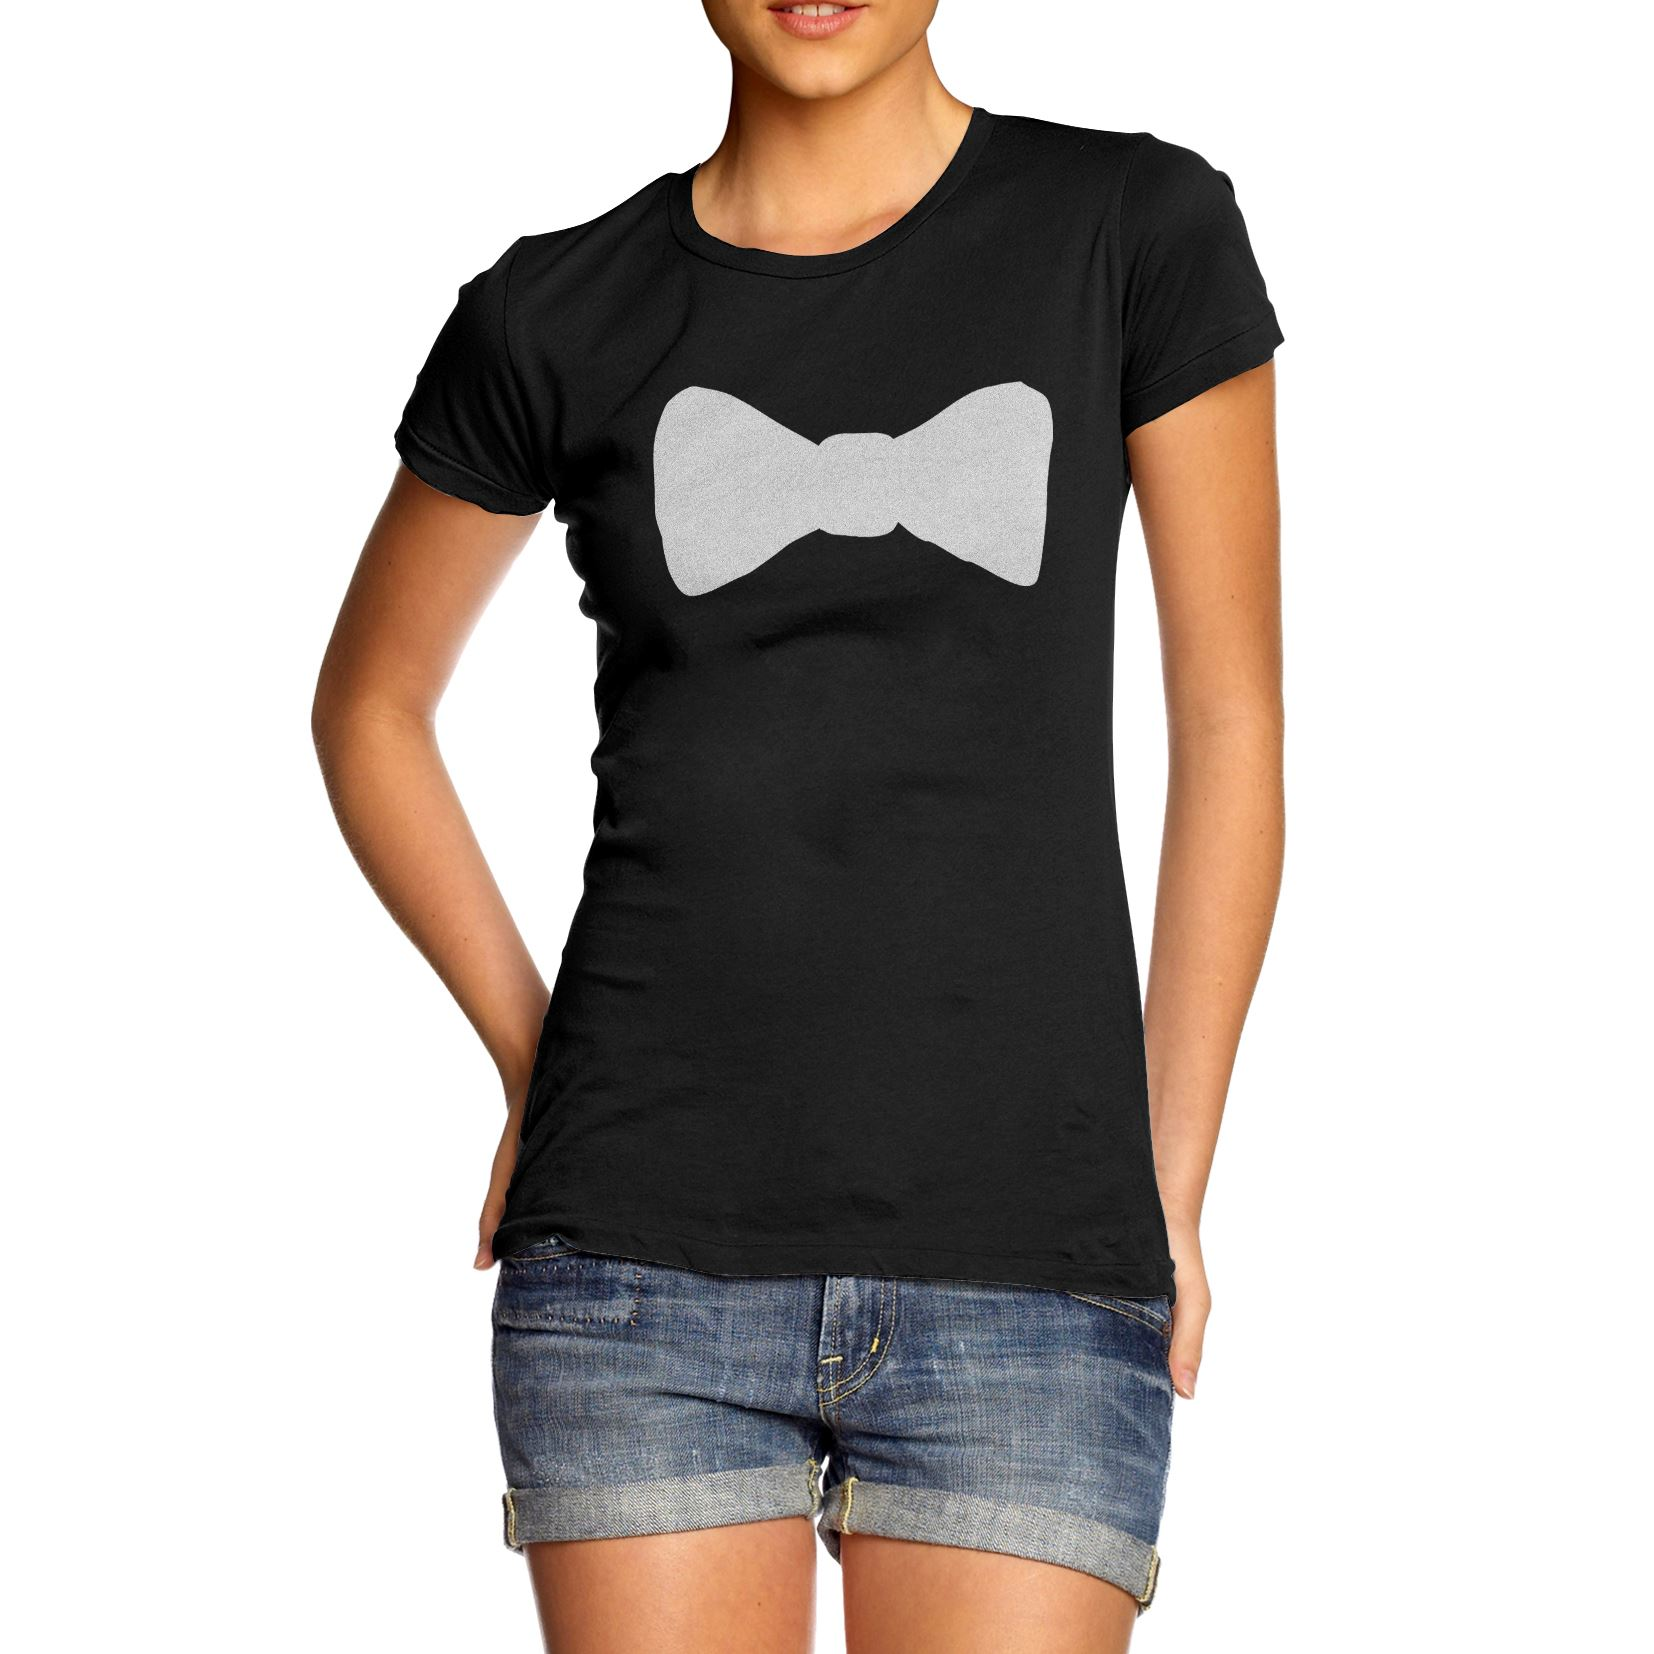 Shirt design womens - Twisted Envy Women 039 S Bow Tie Print